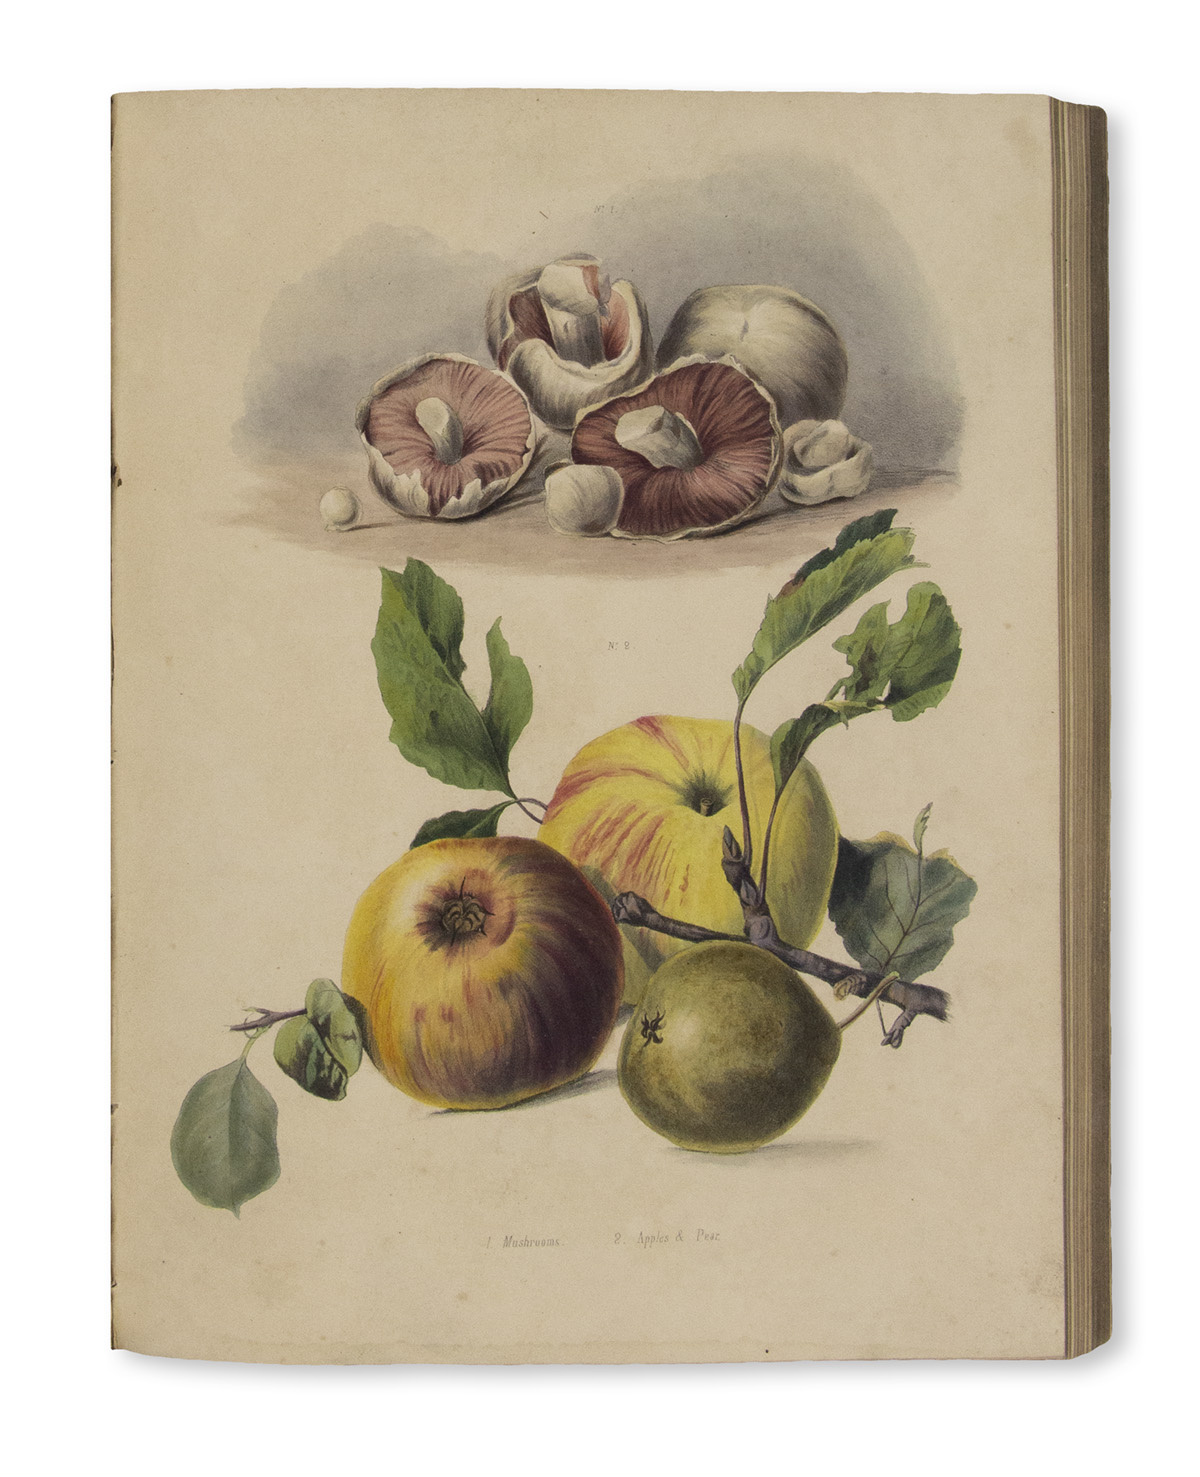 GROVE-HARRIET-The-Calendar-of-Nature-or-The-Seasons-of-Engla